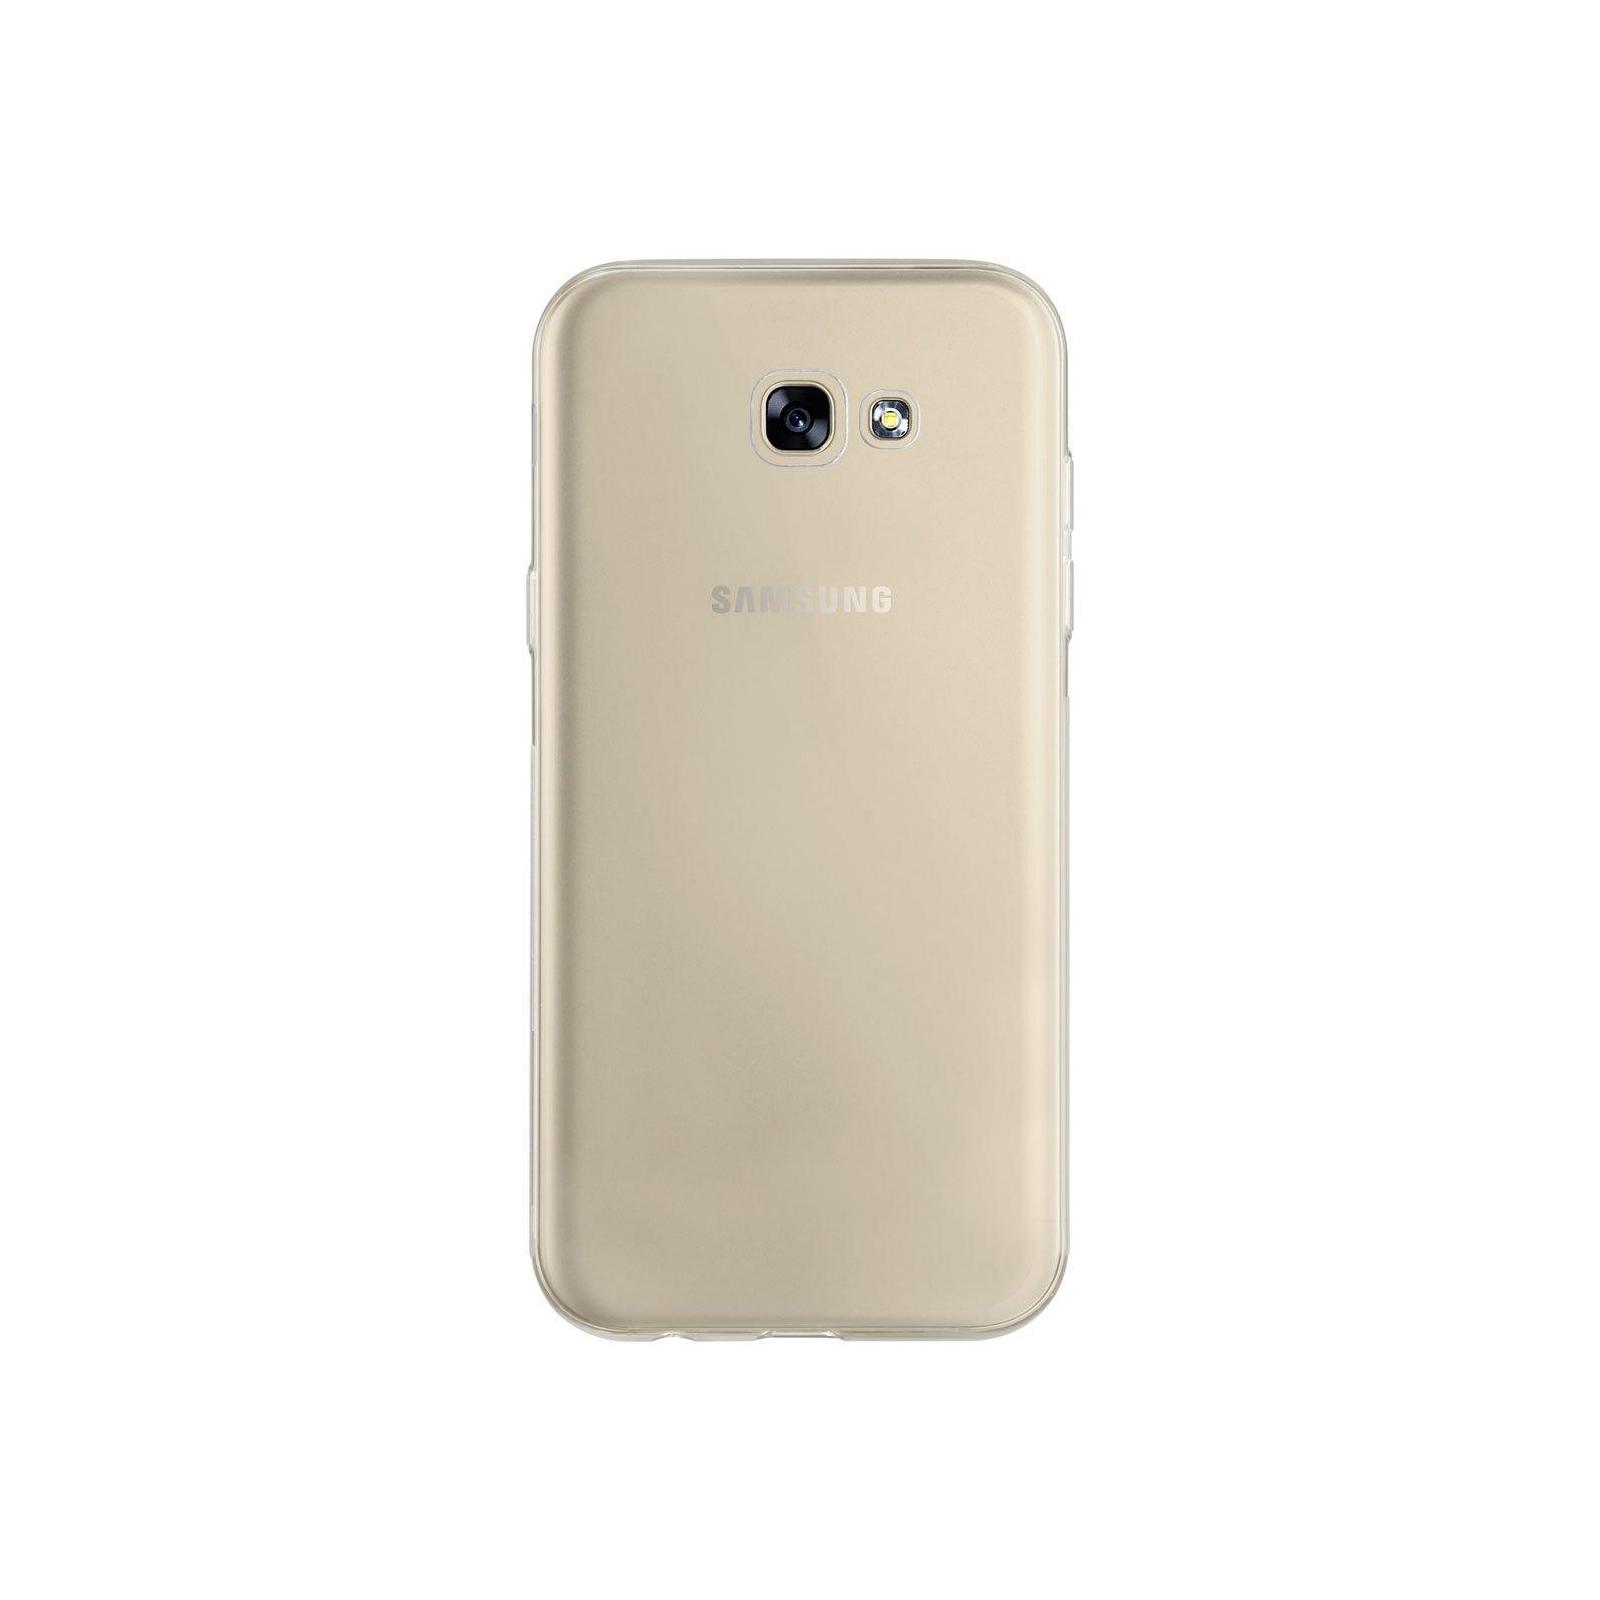 Чехол для моб. телефона SmartCase Samsung Galaxy A3 /A320 TPU Clear (SC-A3) изображение 3